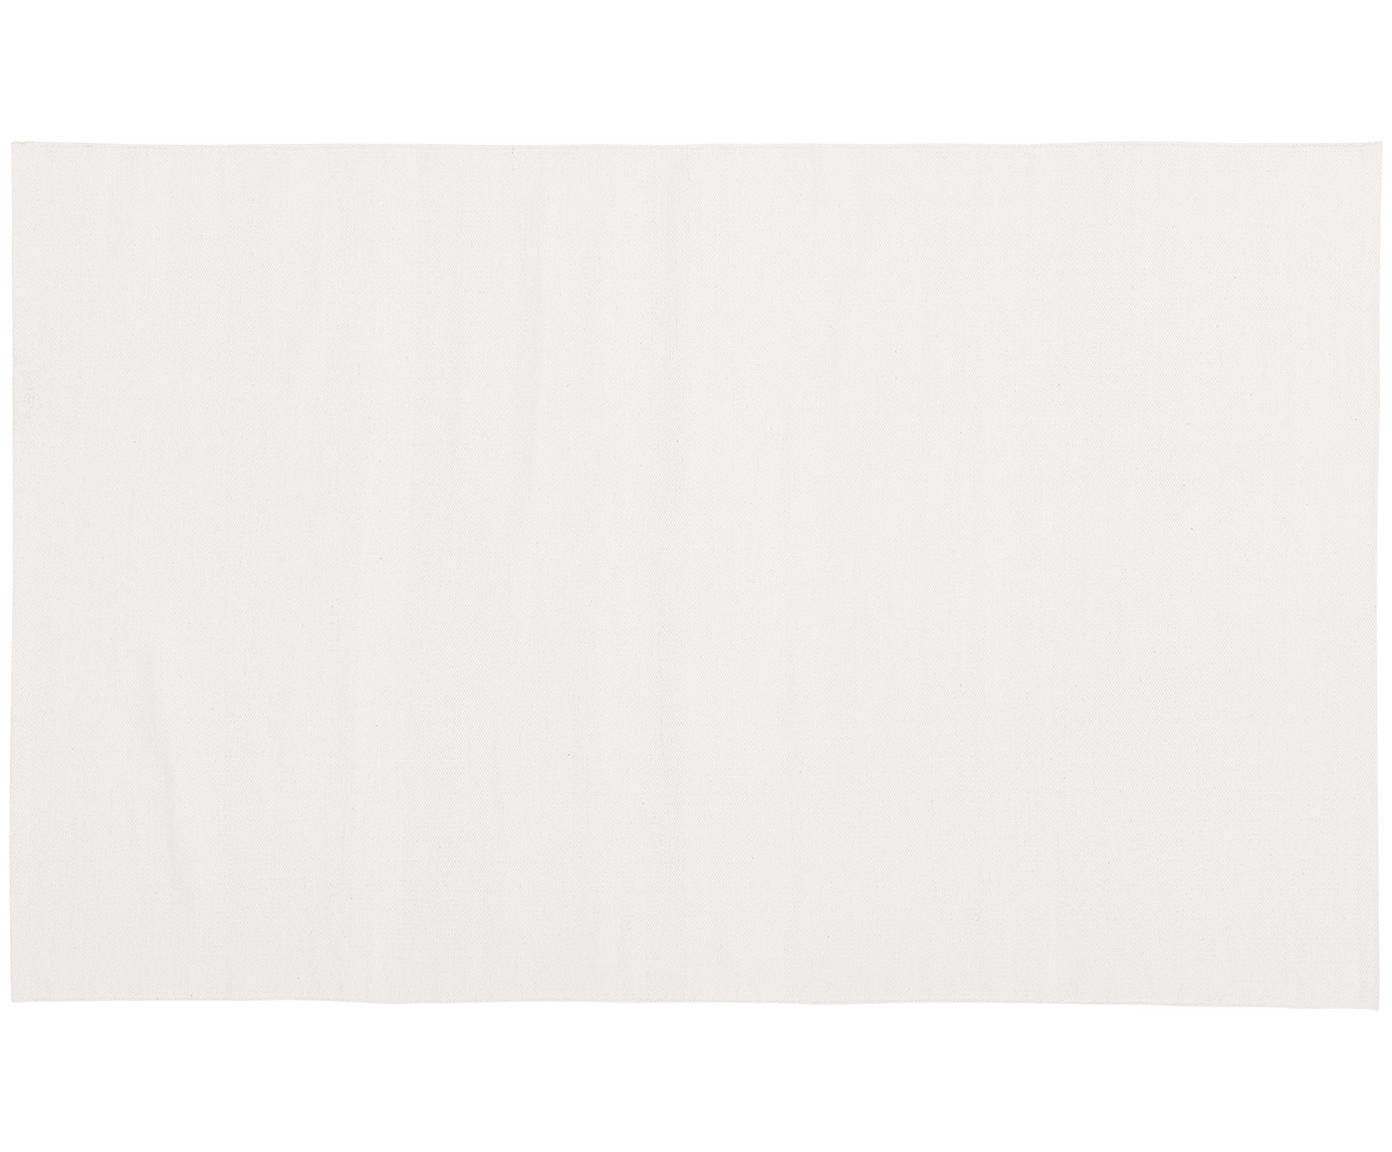 Dünner Baumwollteppich Agneta, handgewebt, 100% Baumwolle, Cremeweiss, B 50 x L 80 cm (Grösse XXS)